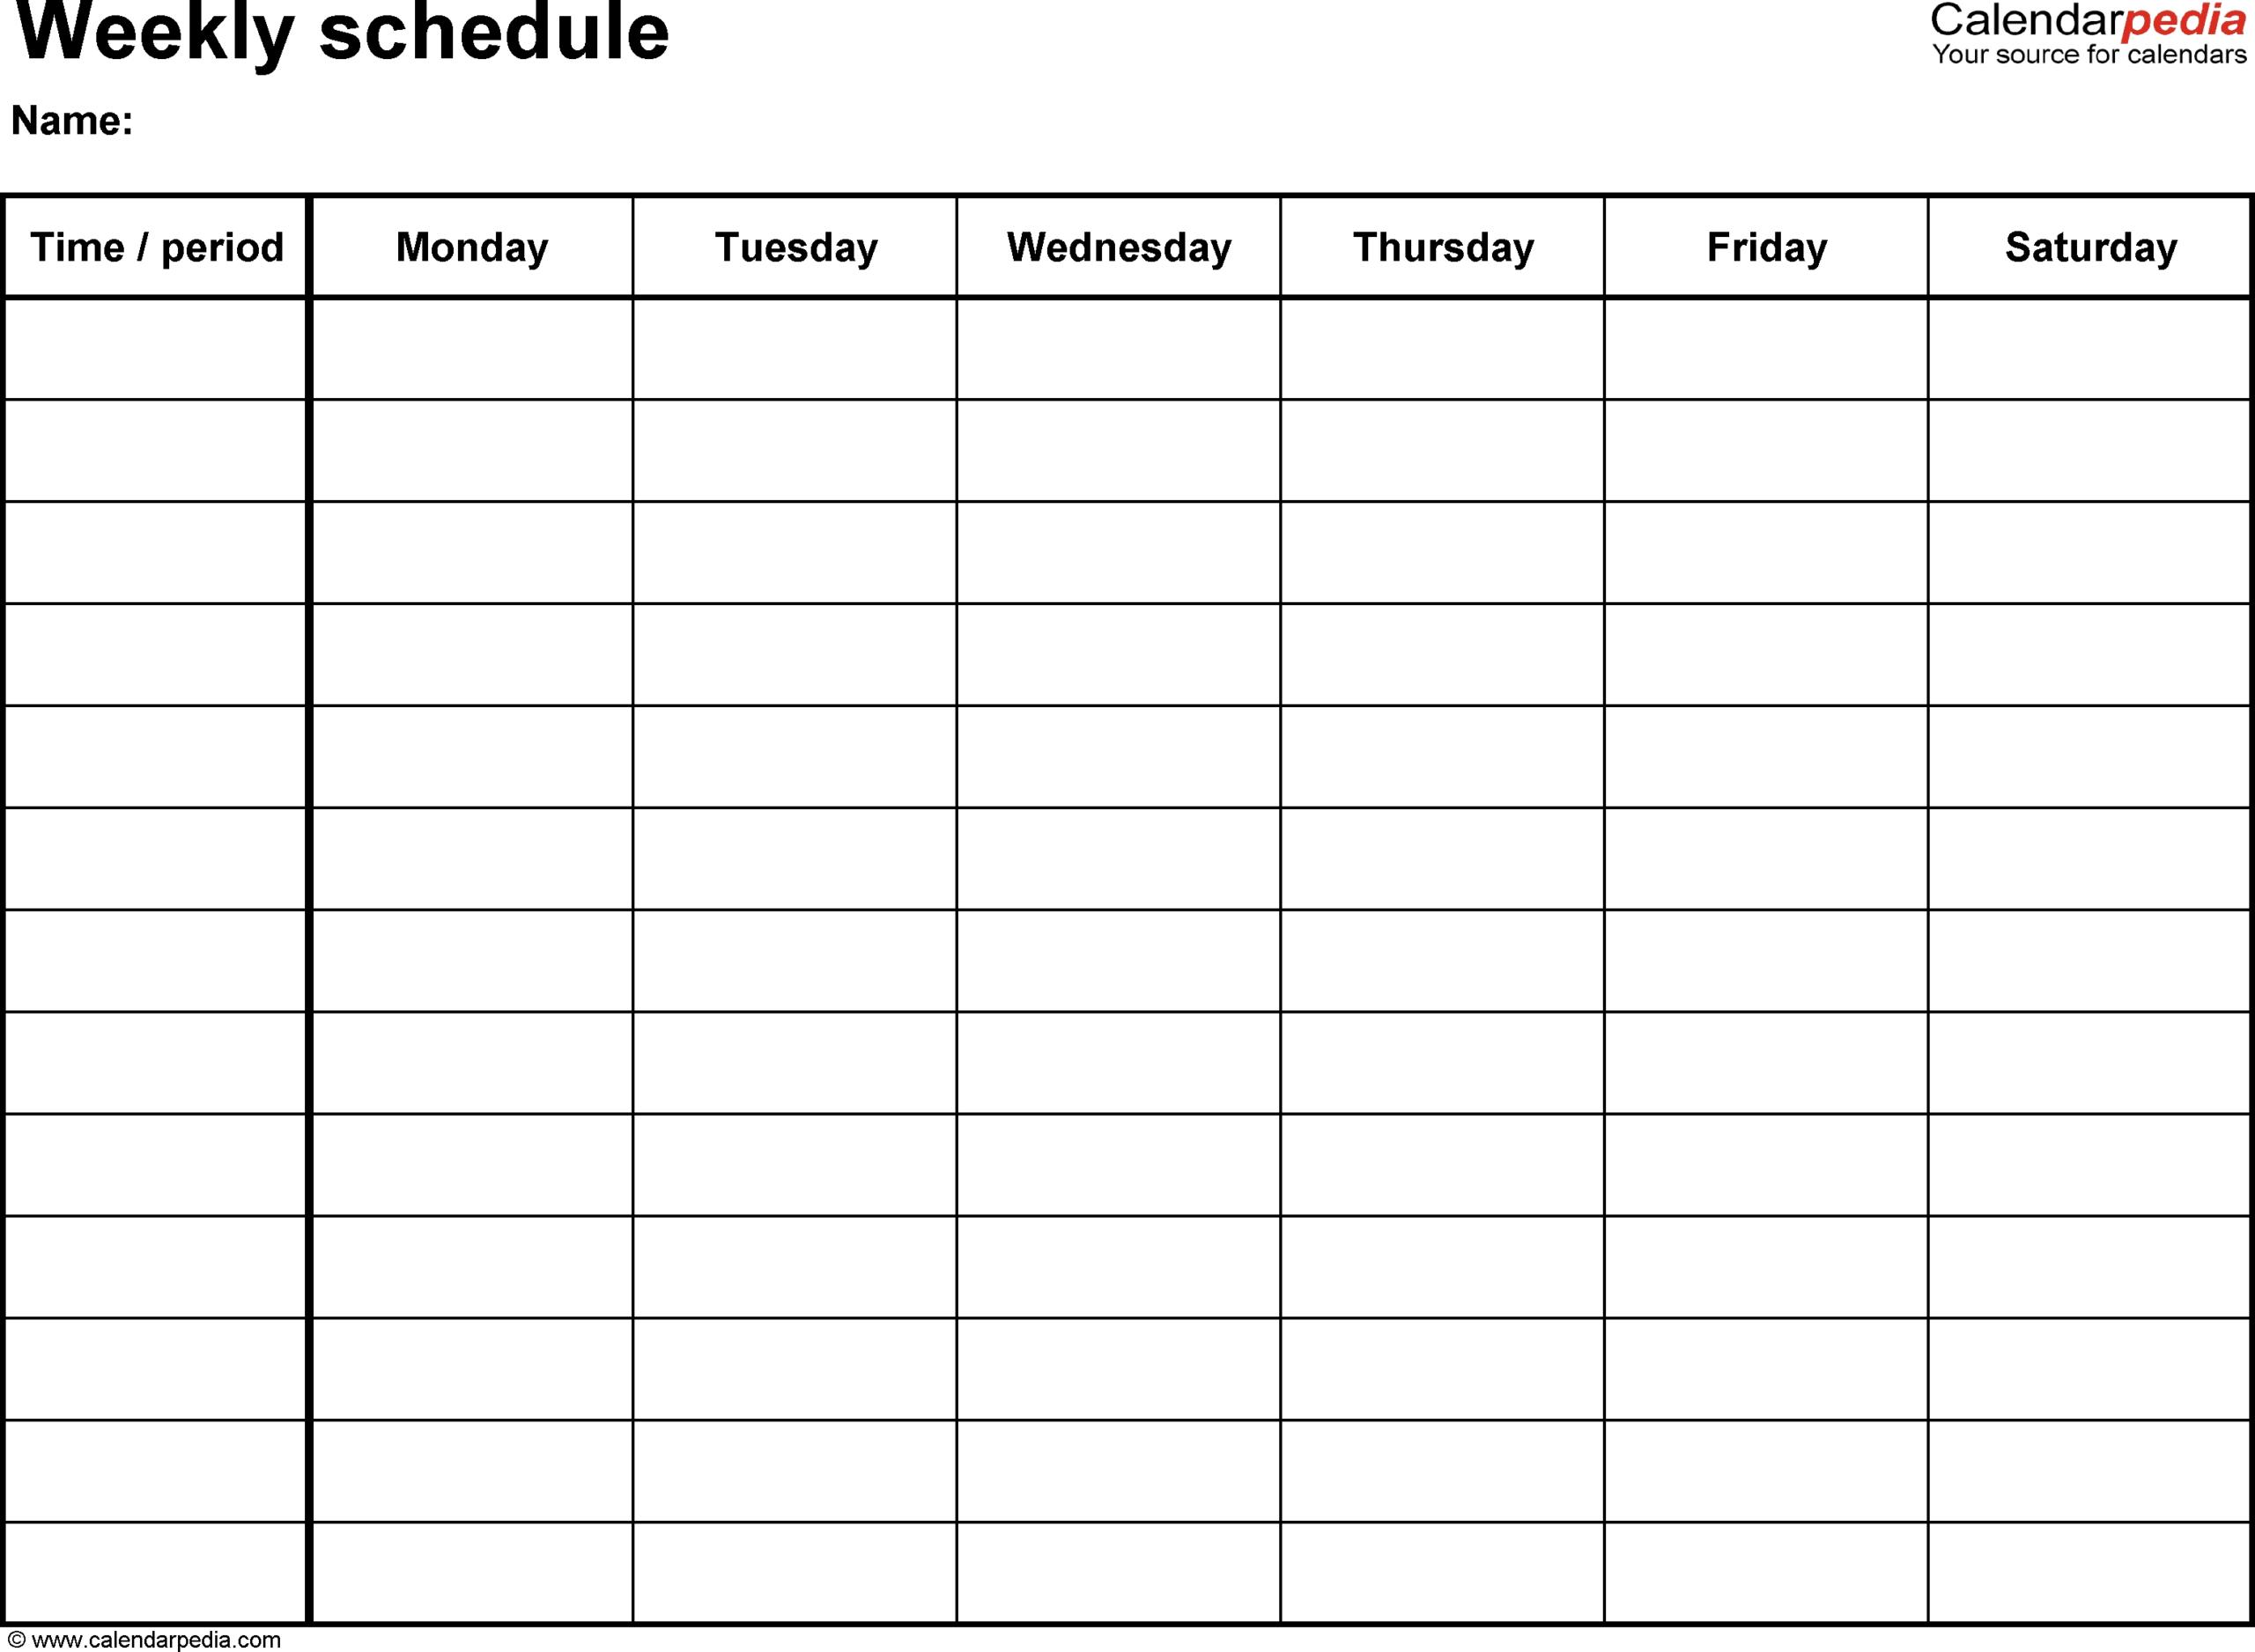 Calendar Fill In Templates | Calendar Template Printable inside Fill In Calendar